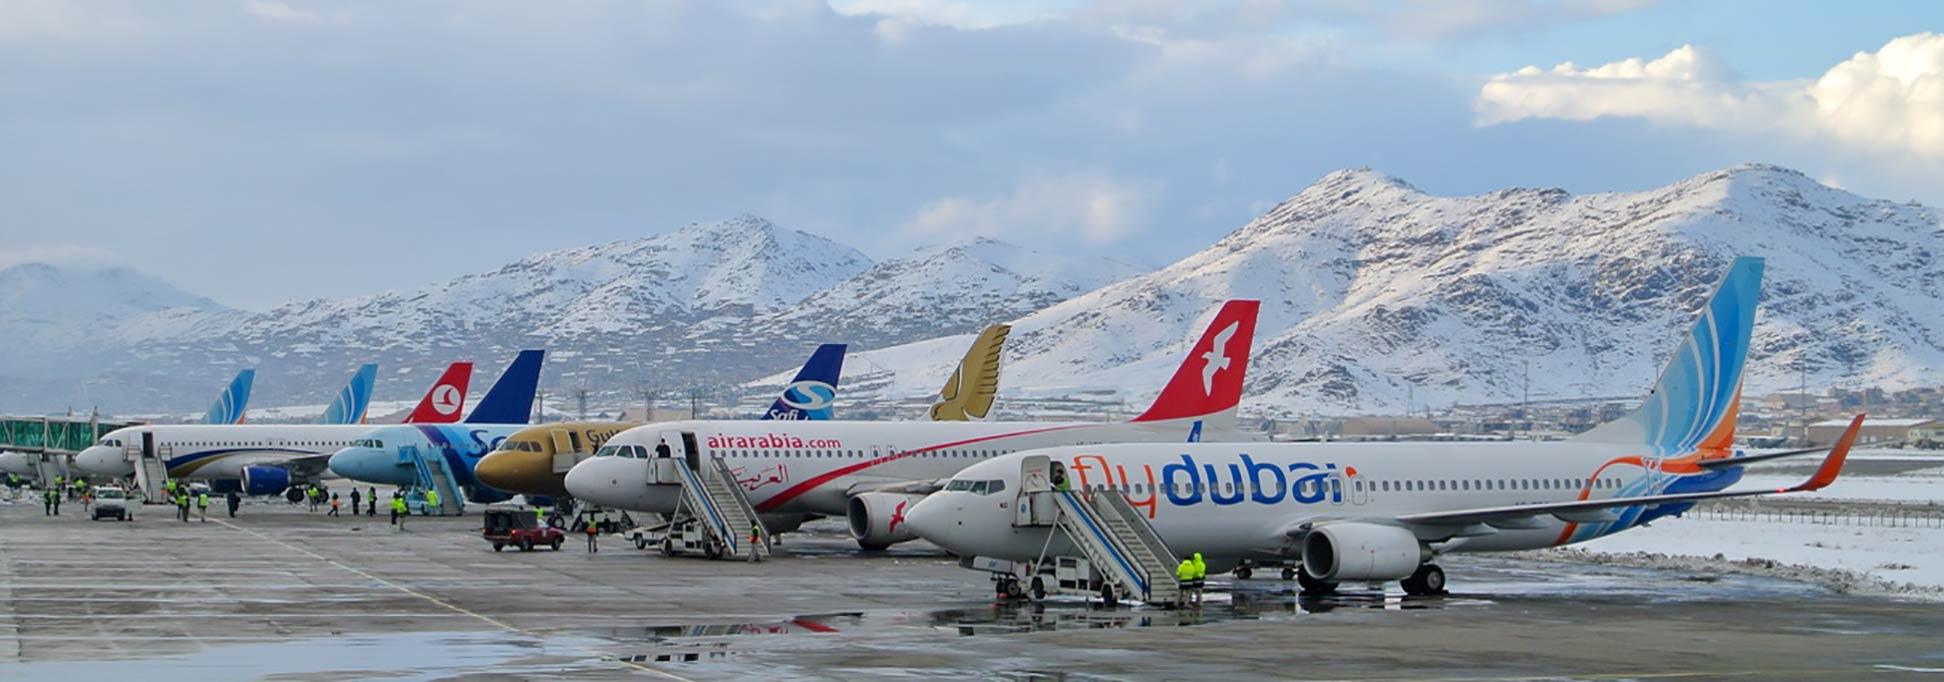 Airports around the World - IATA code: K - Nations Online